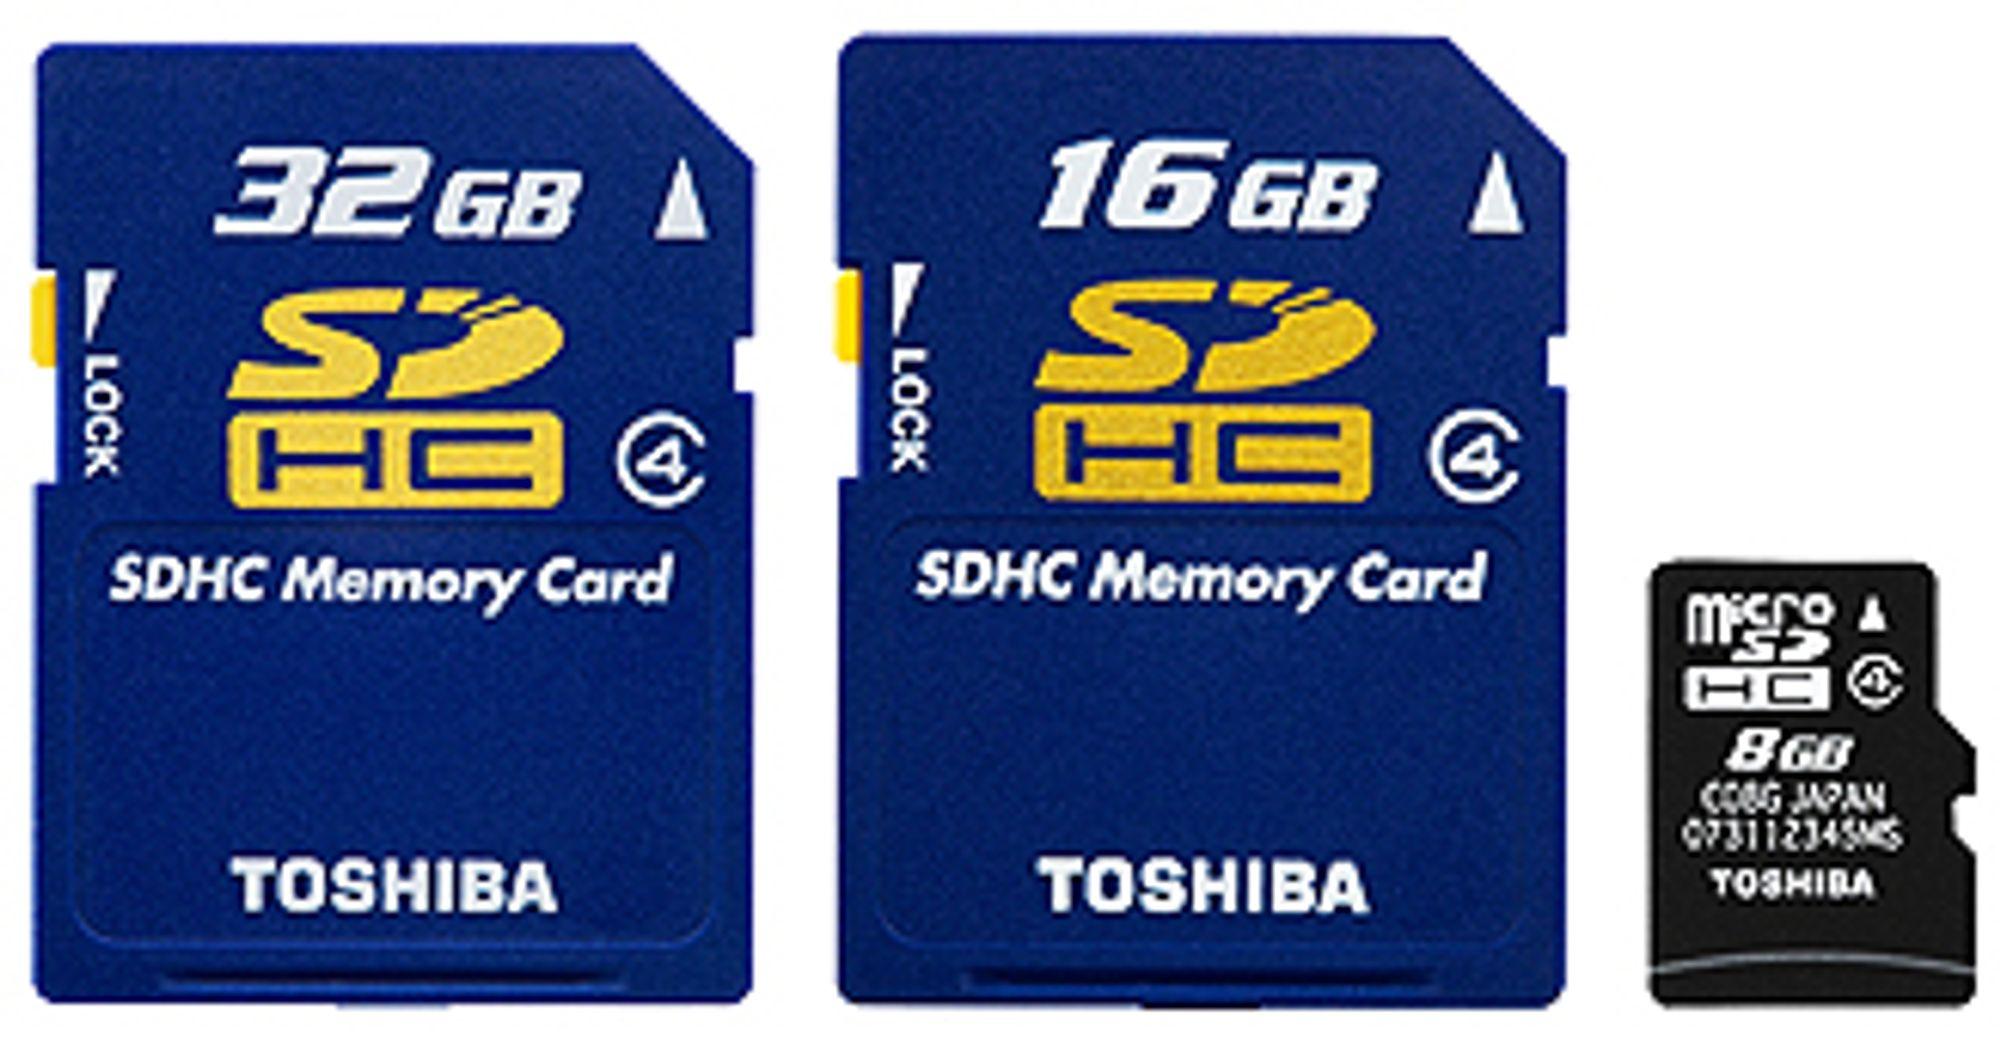 Nye minnekort fra Toshiba.